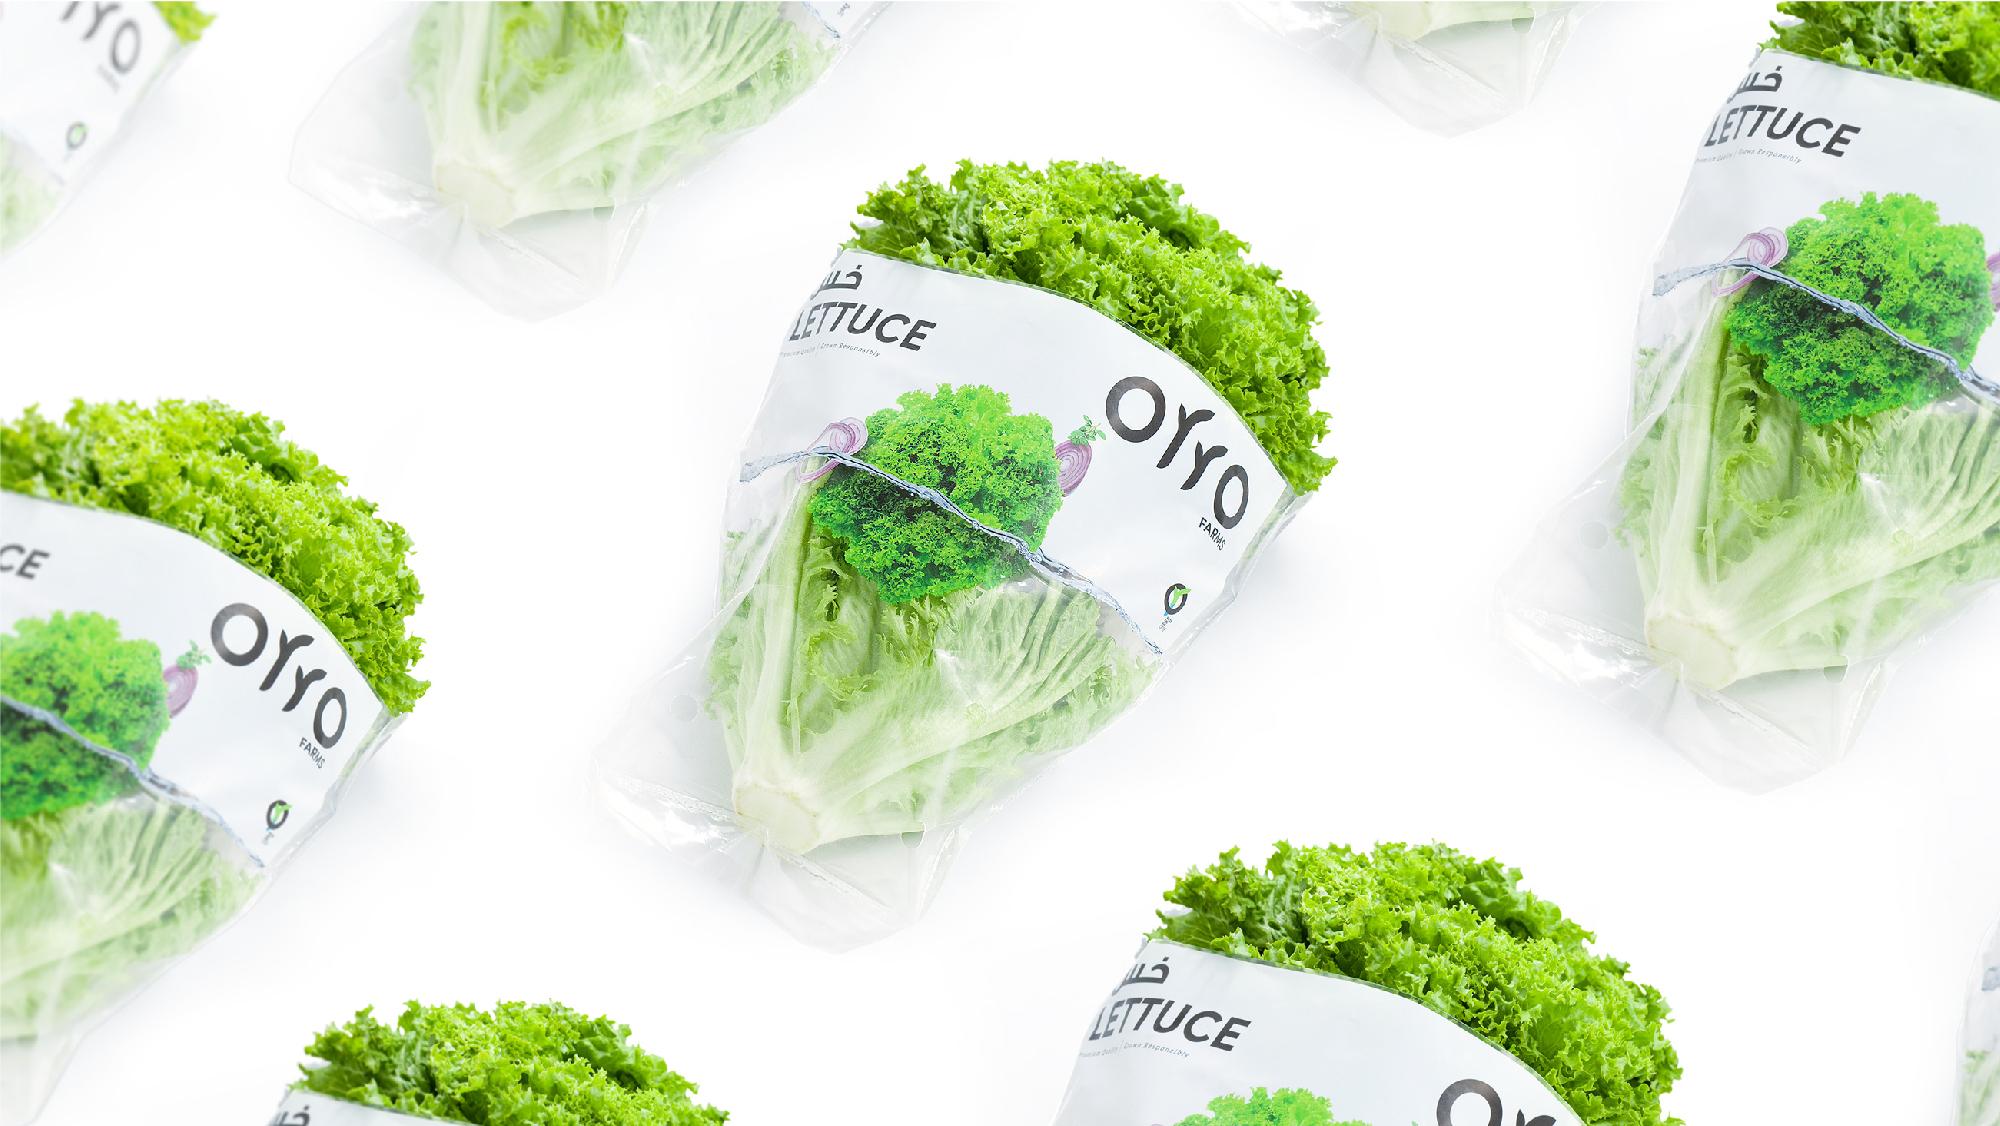 Orro-Farms-13